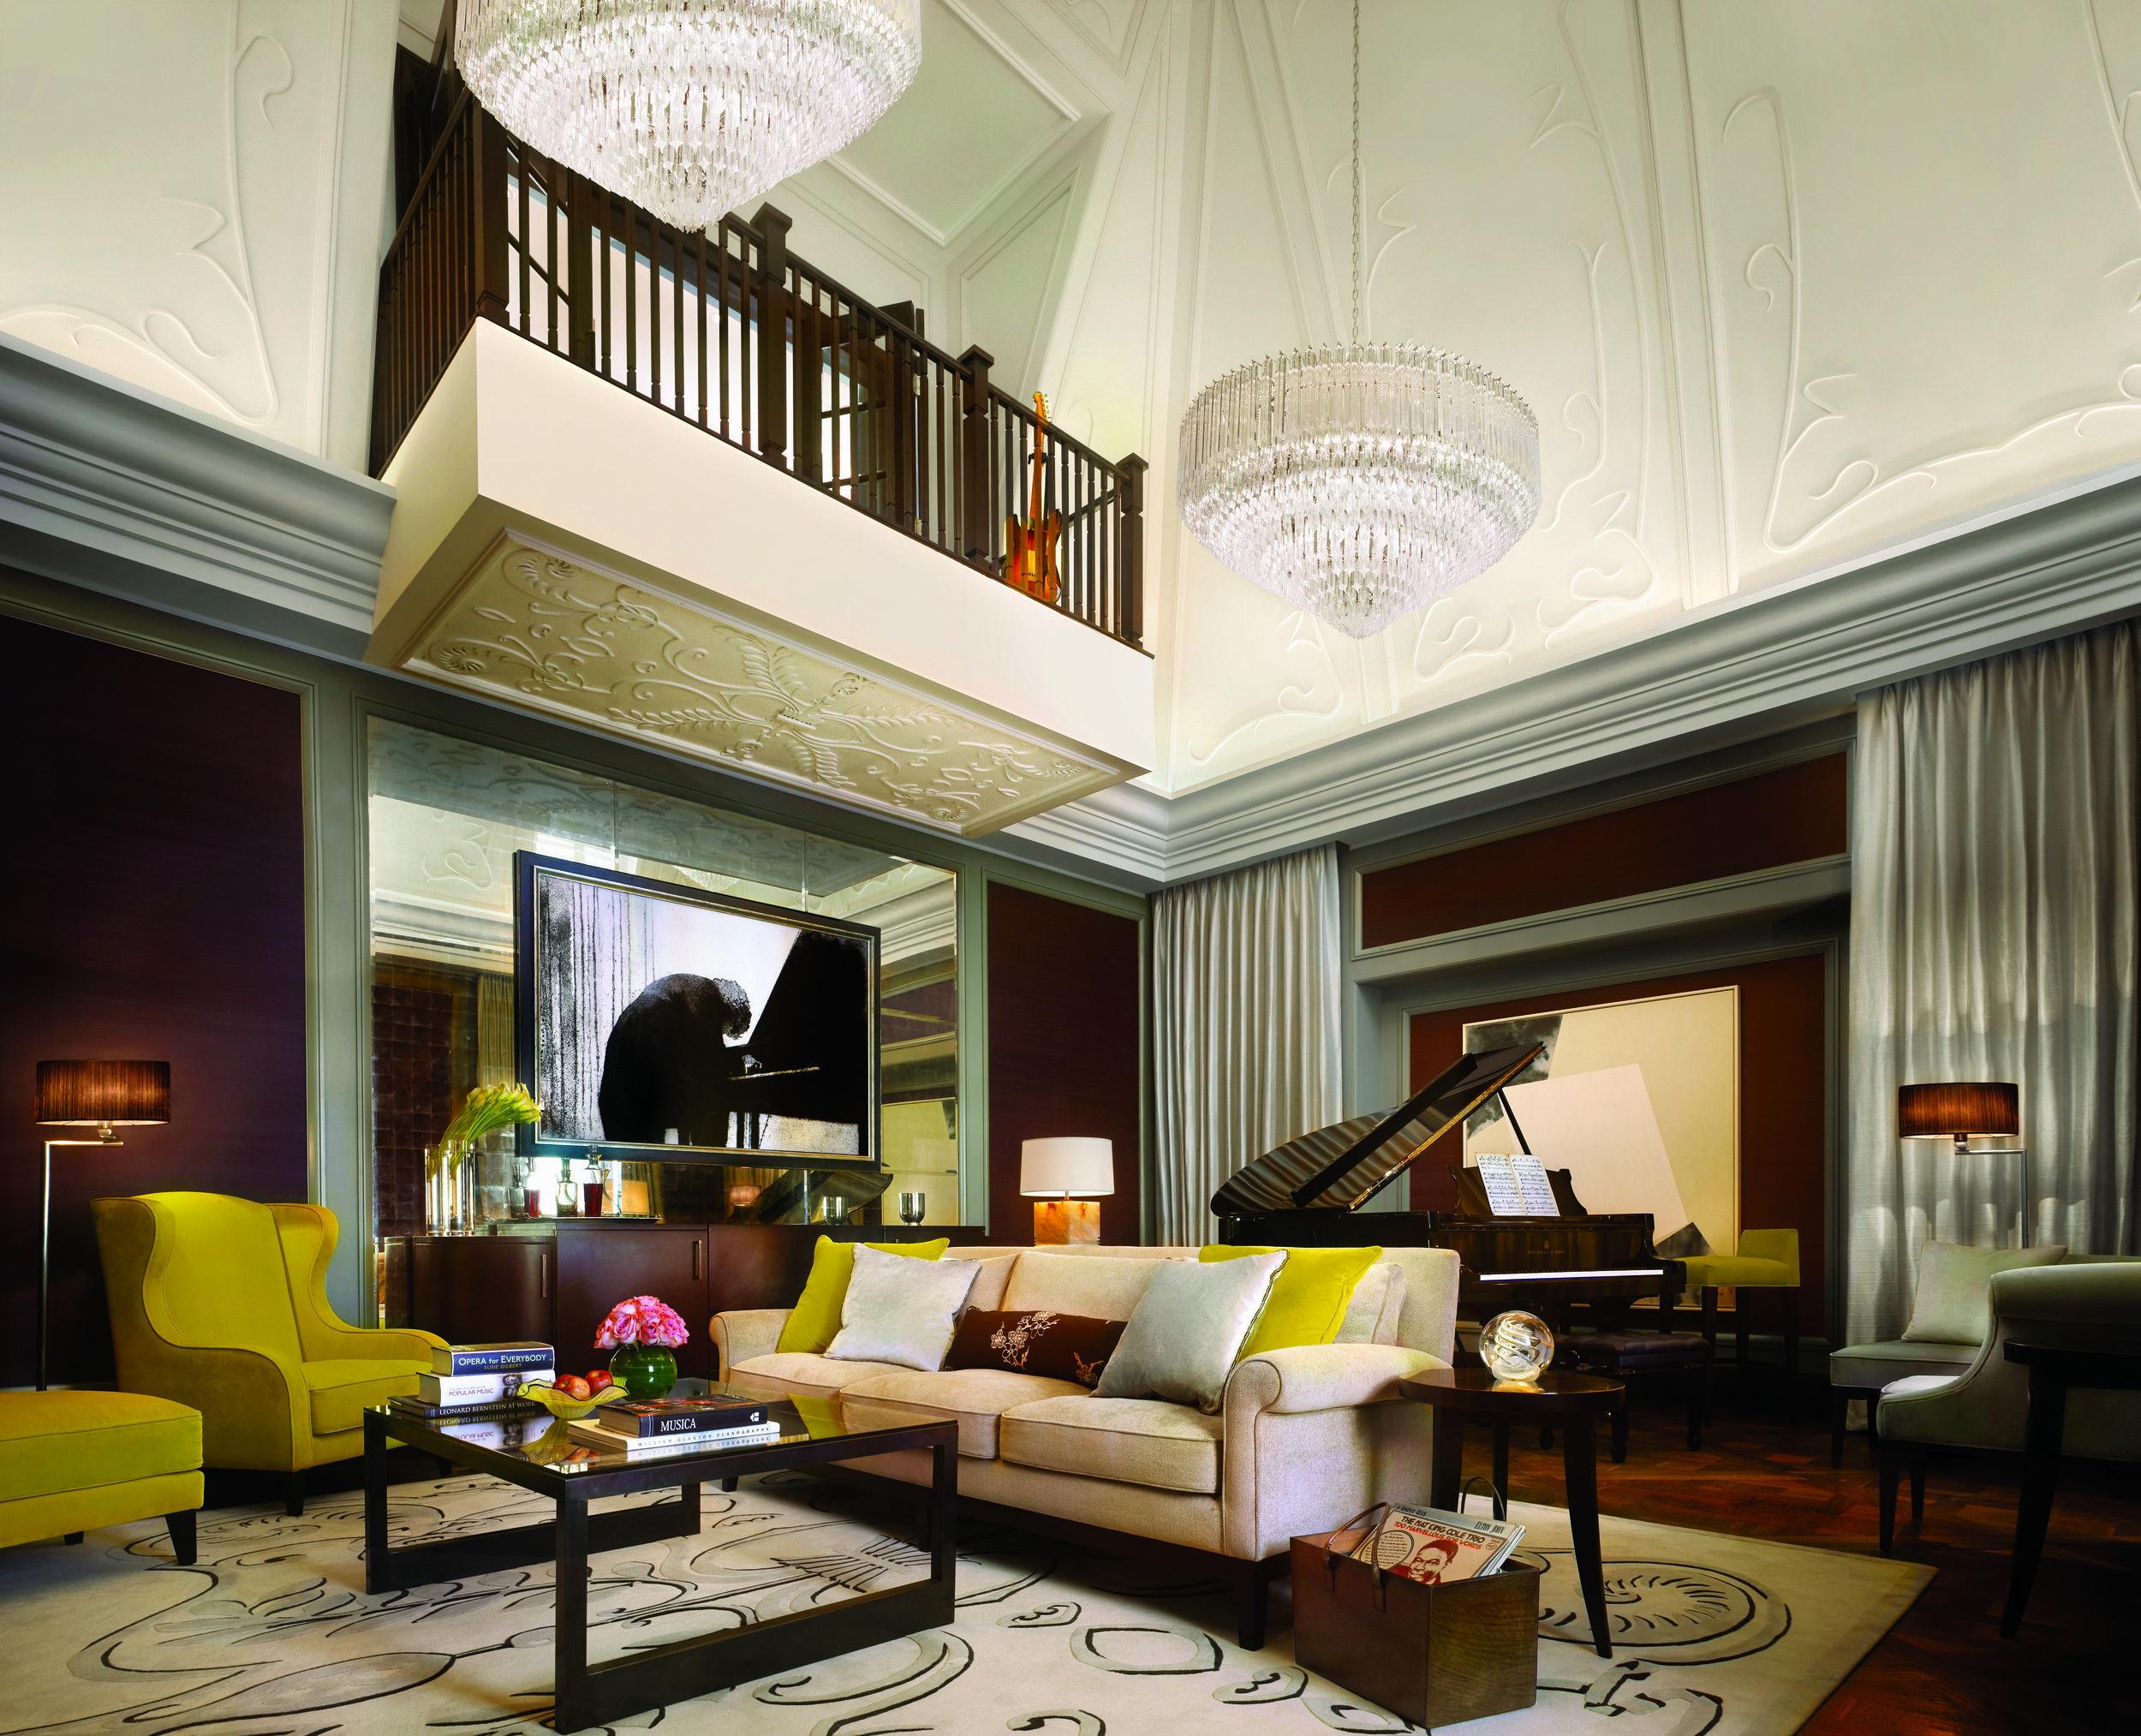 Musicians Penthouse Double Height Lounge Corinthia Hotel London.jpg